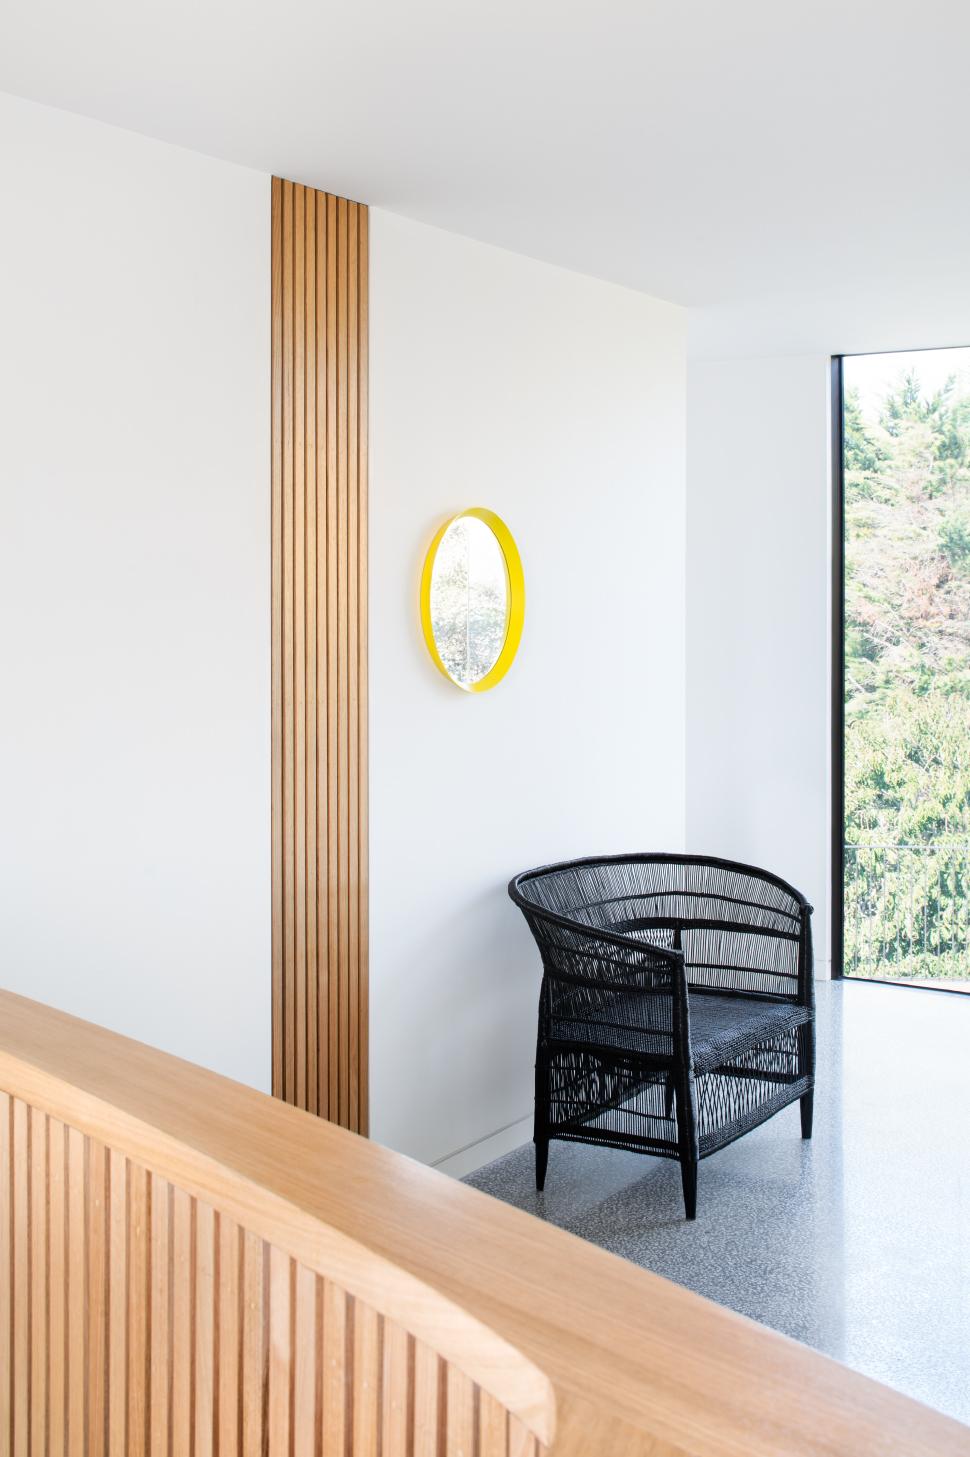 parkside beach house by cera stribley architects_15